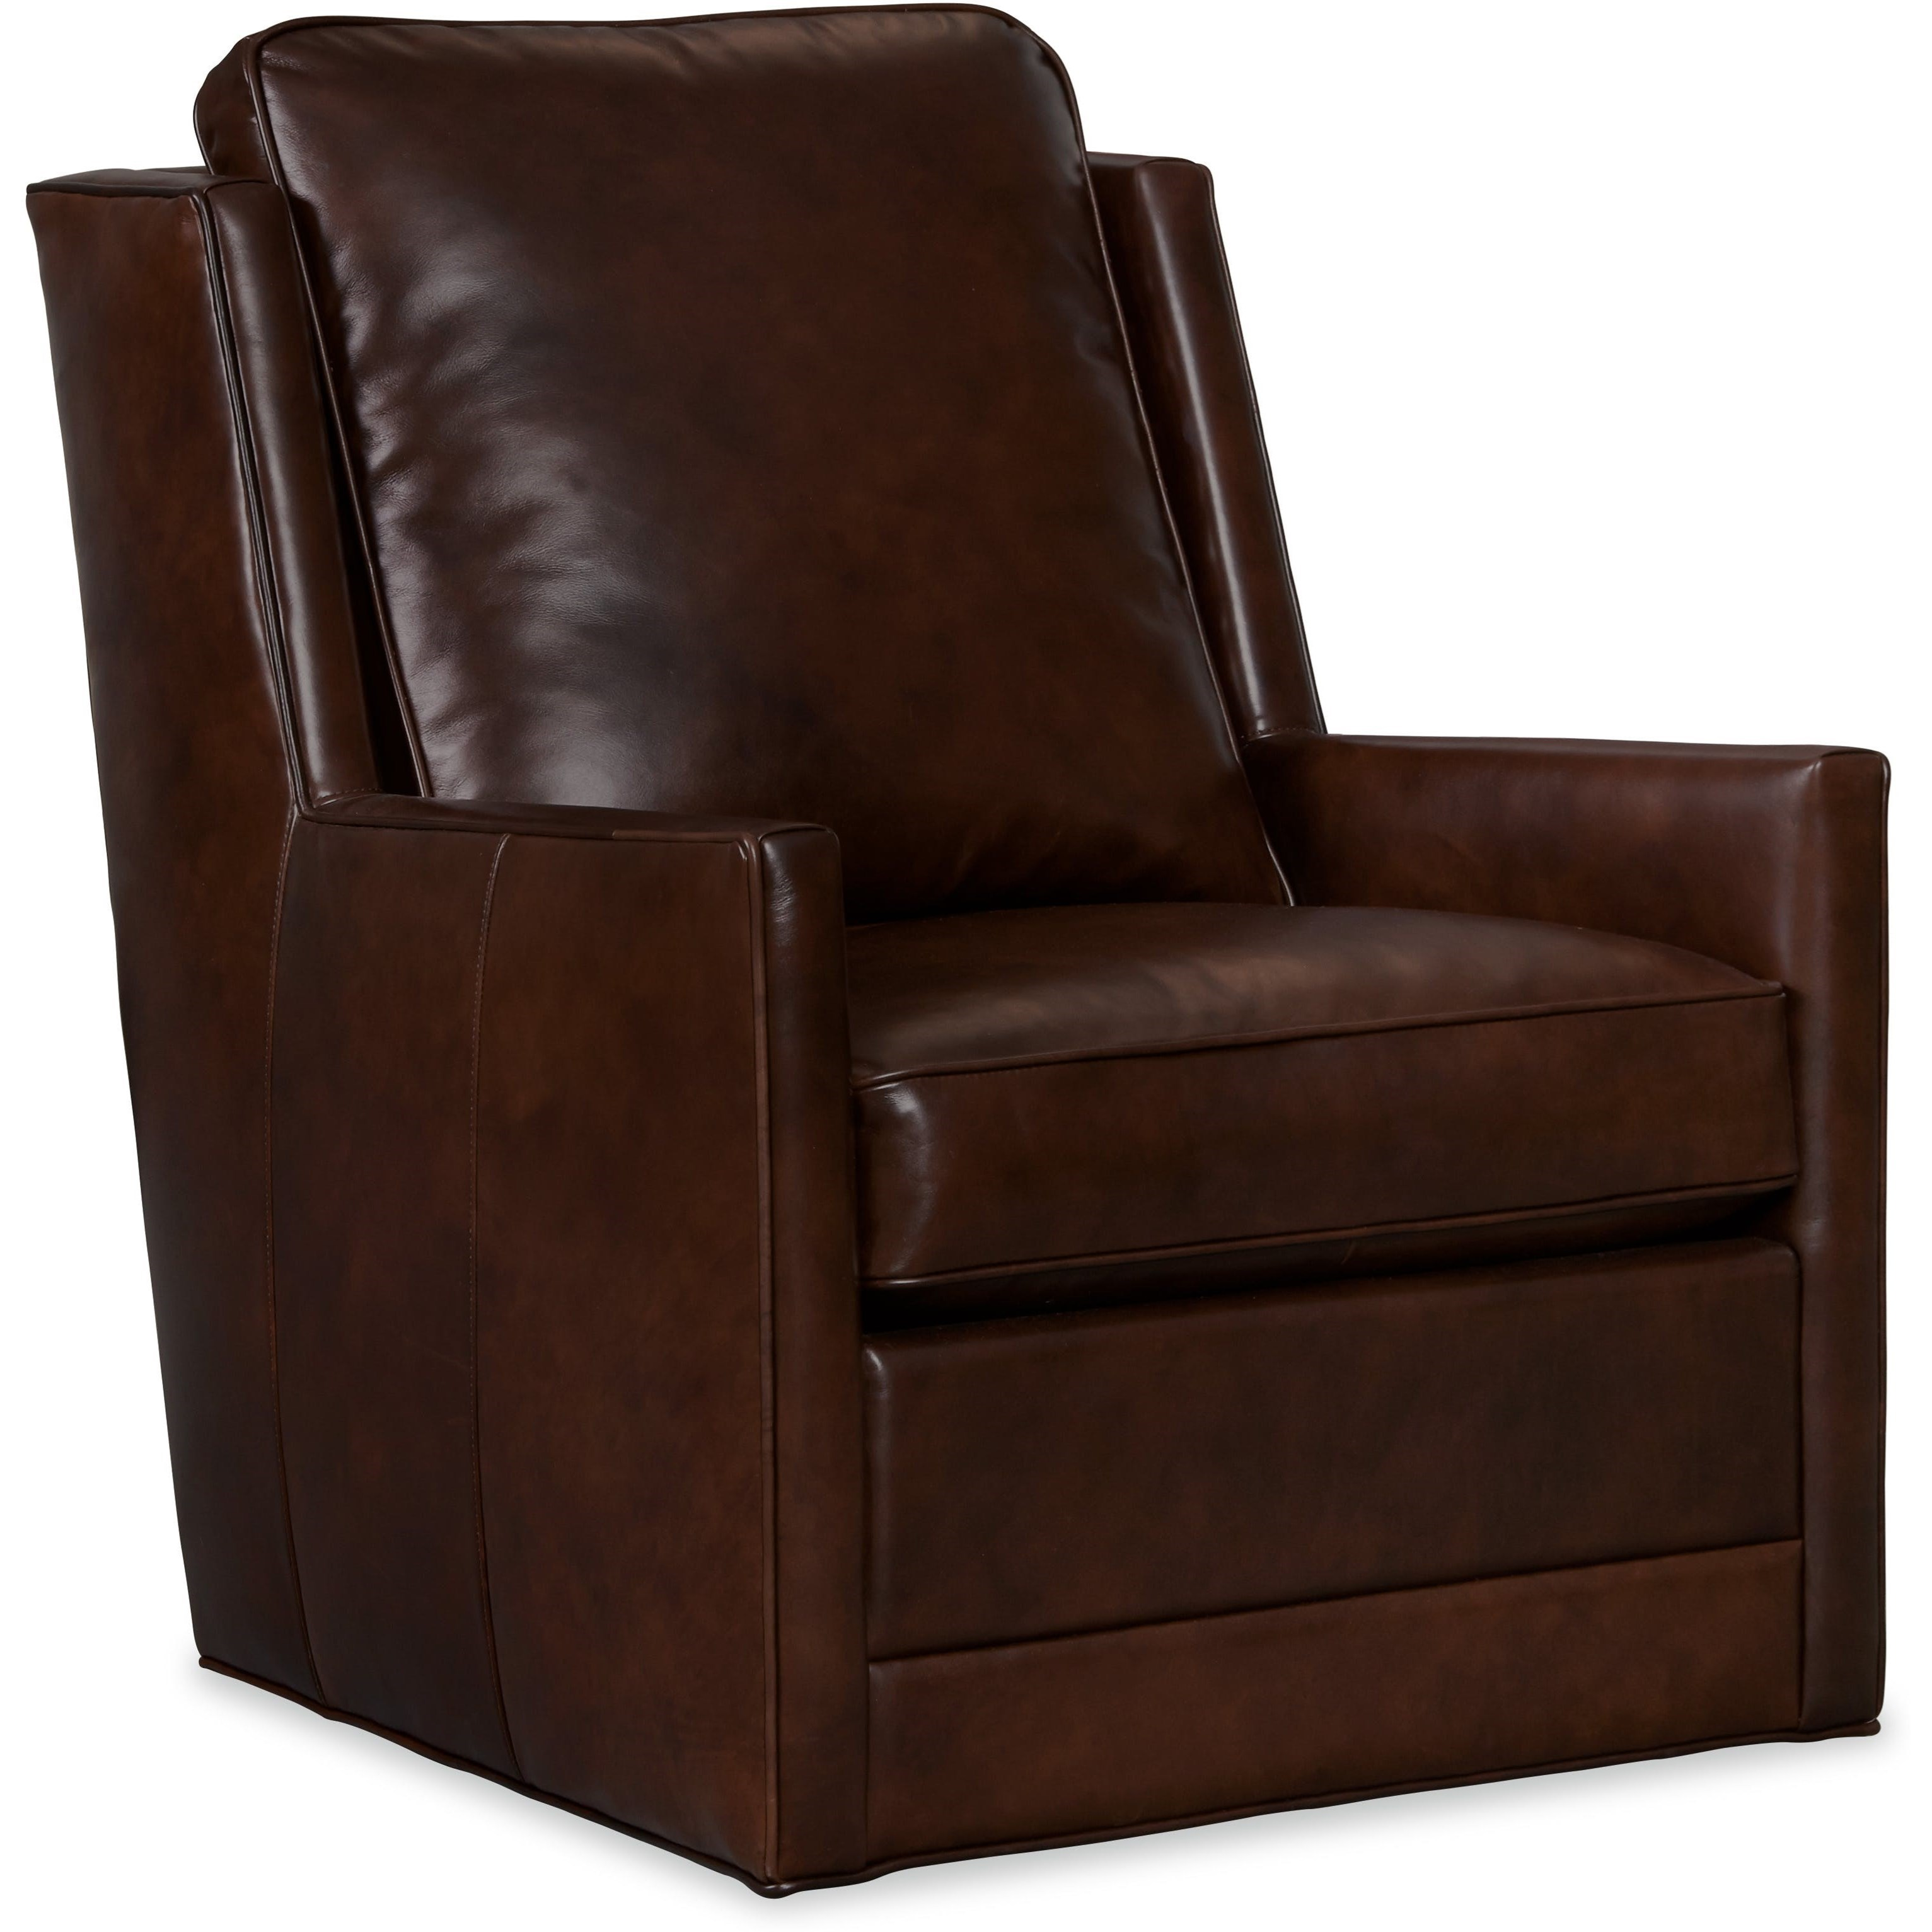 Magnificent Hooker Furniture Club Chairs Cc479 Sw 085 Transitional Spiritservingveterans Wood Chair Design Ideas Spiritservingveteransorg